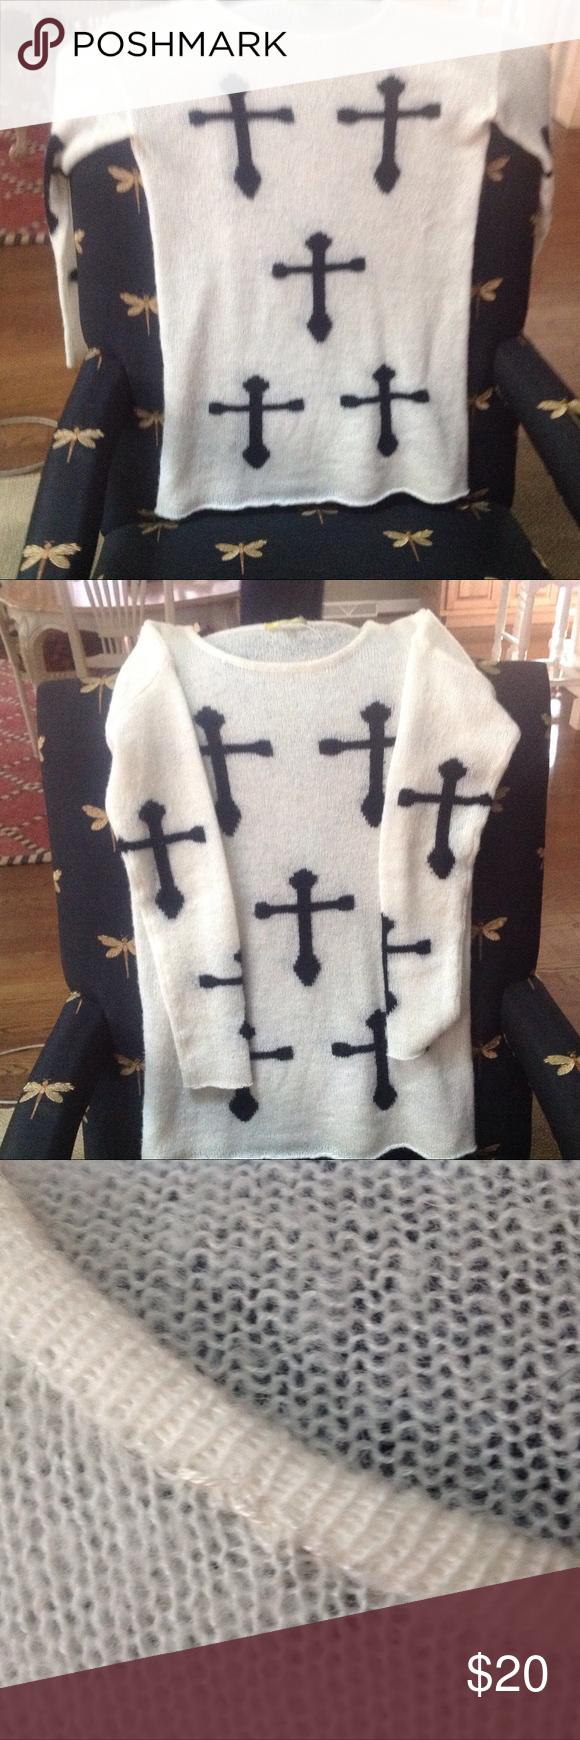 5d145a446b Gianni Bini cross sweater Bought on poshmark wrong type of fit. NWT longer  tunic sweater